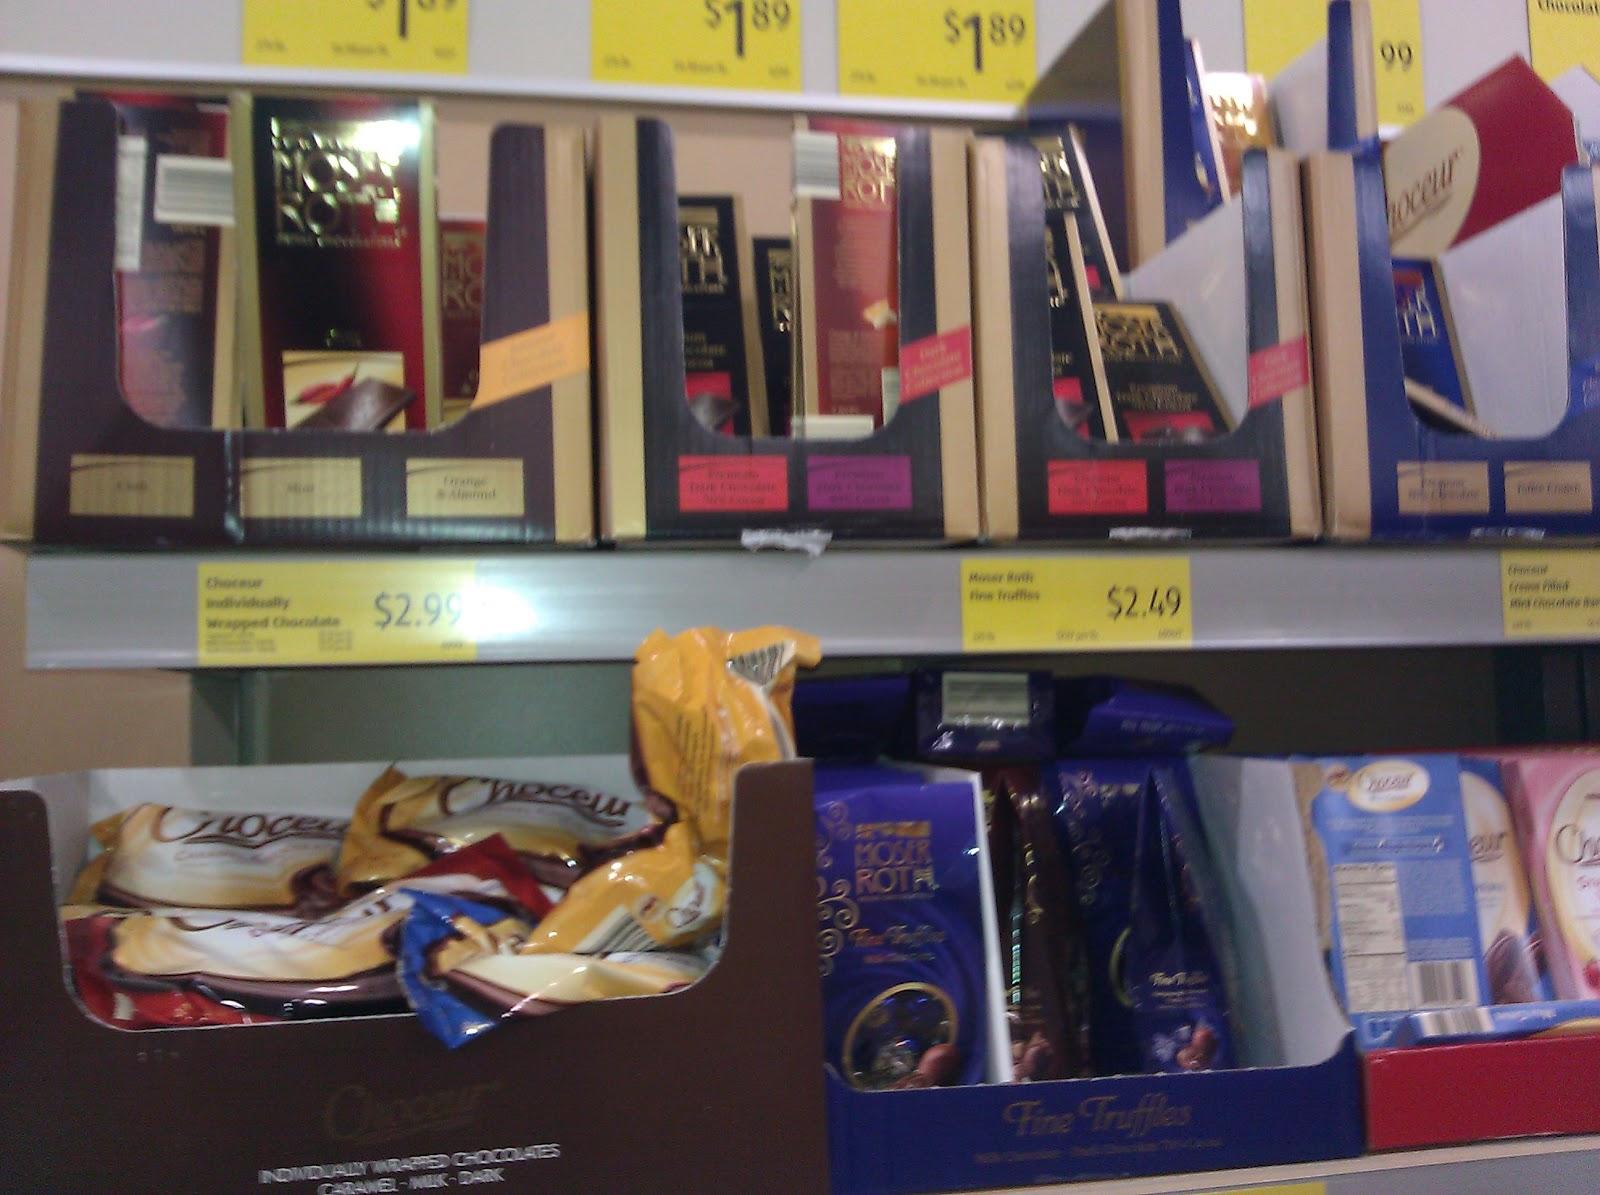 Moser Roth Dark Chocolate Houston Tx